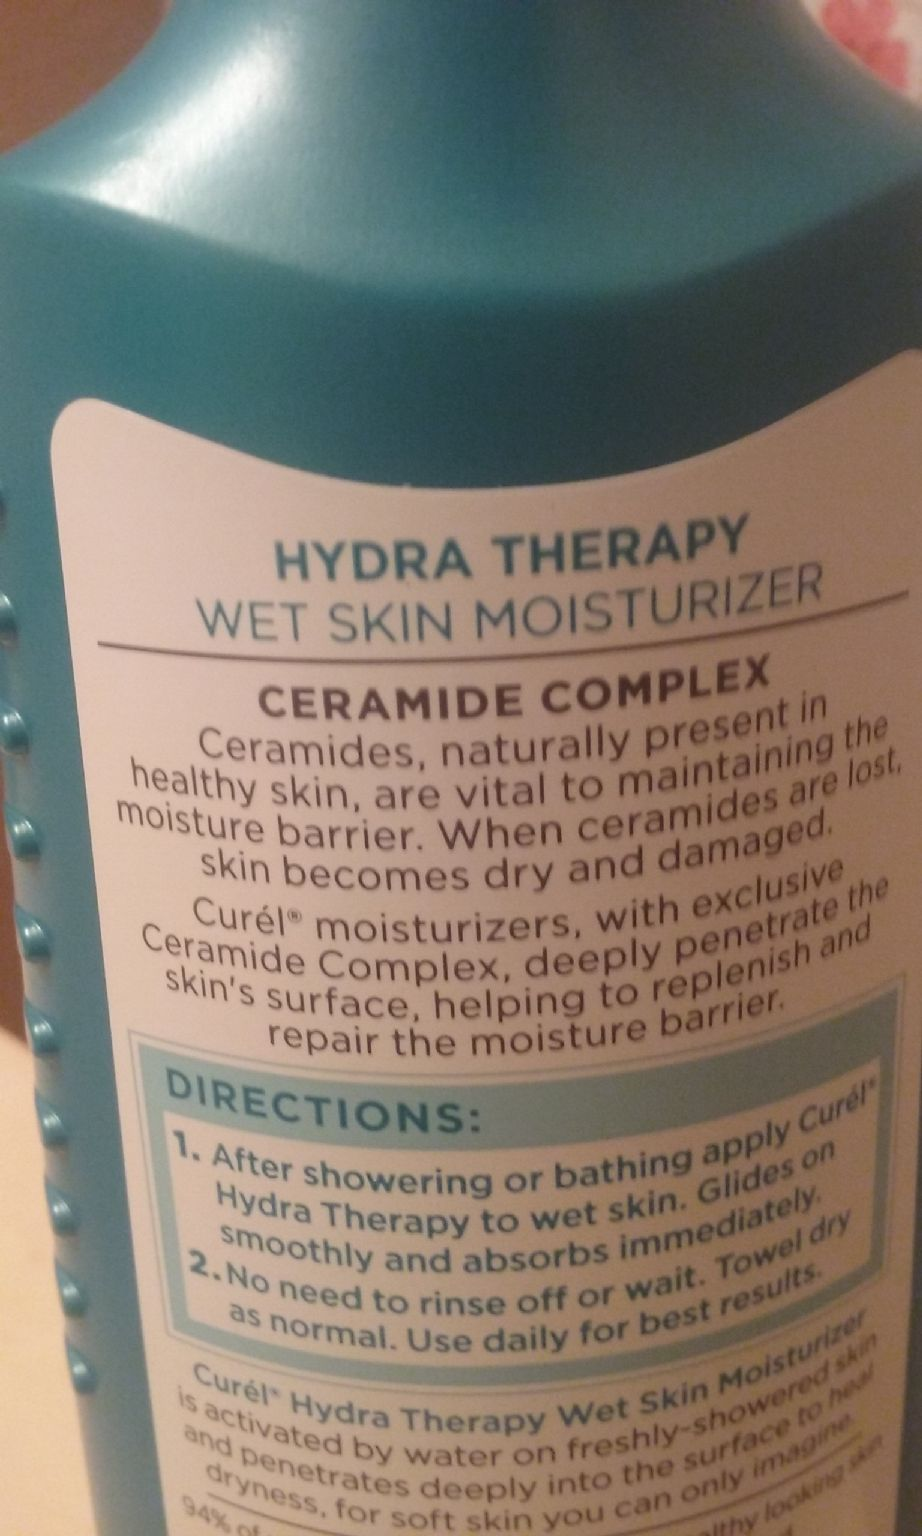 Hydra Therapy Hydra Therapy